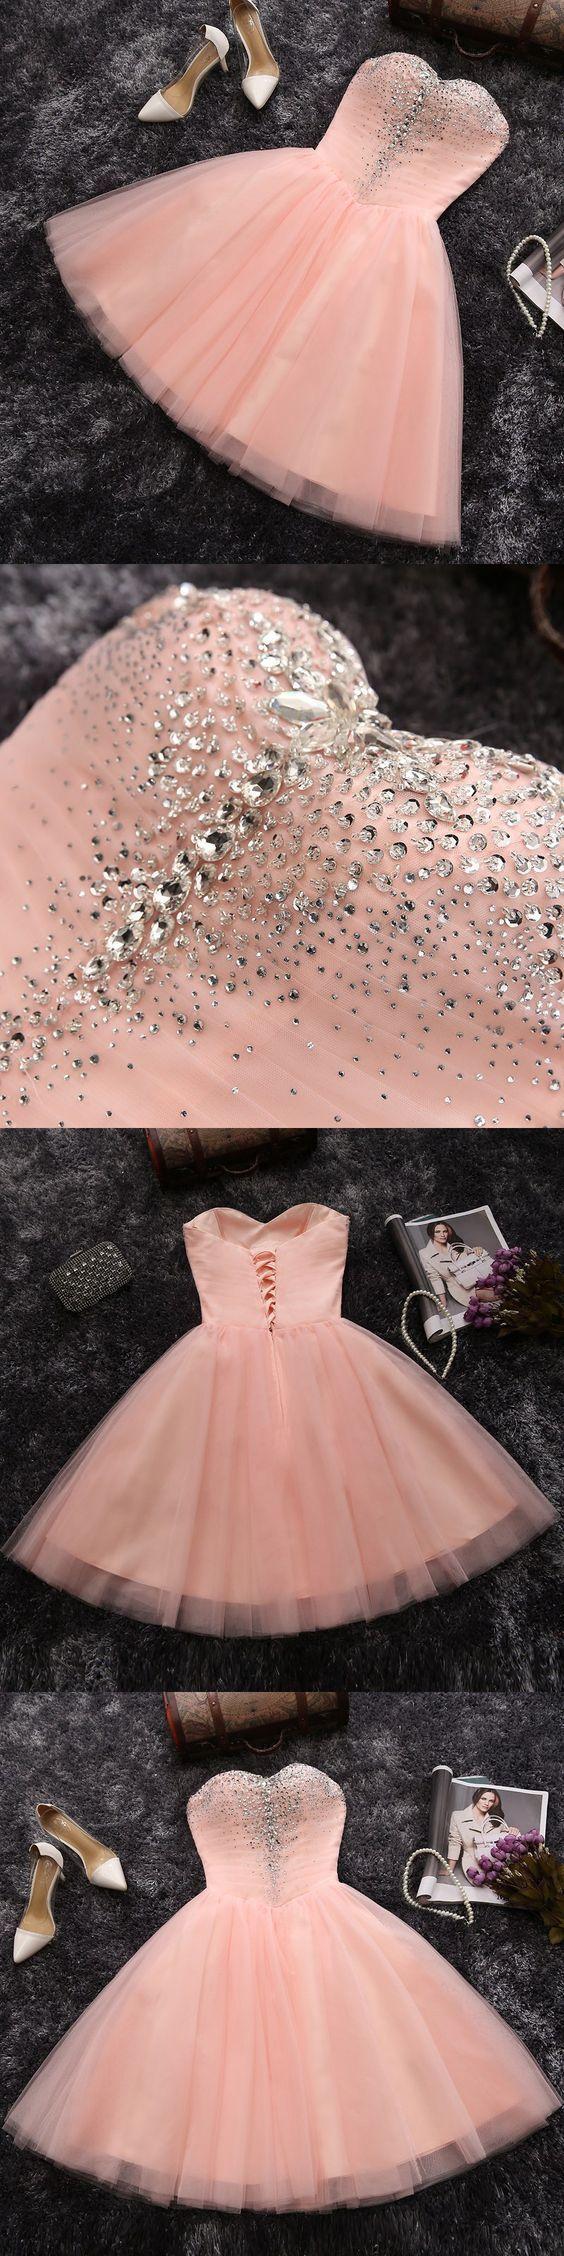 Charming Prom Dress,Tulle Pink Prom Dress,Short Prom Dresses,Cute #homecomingdresses